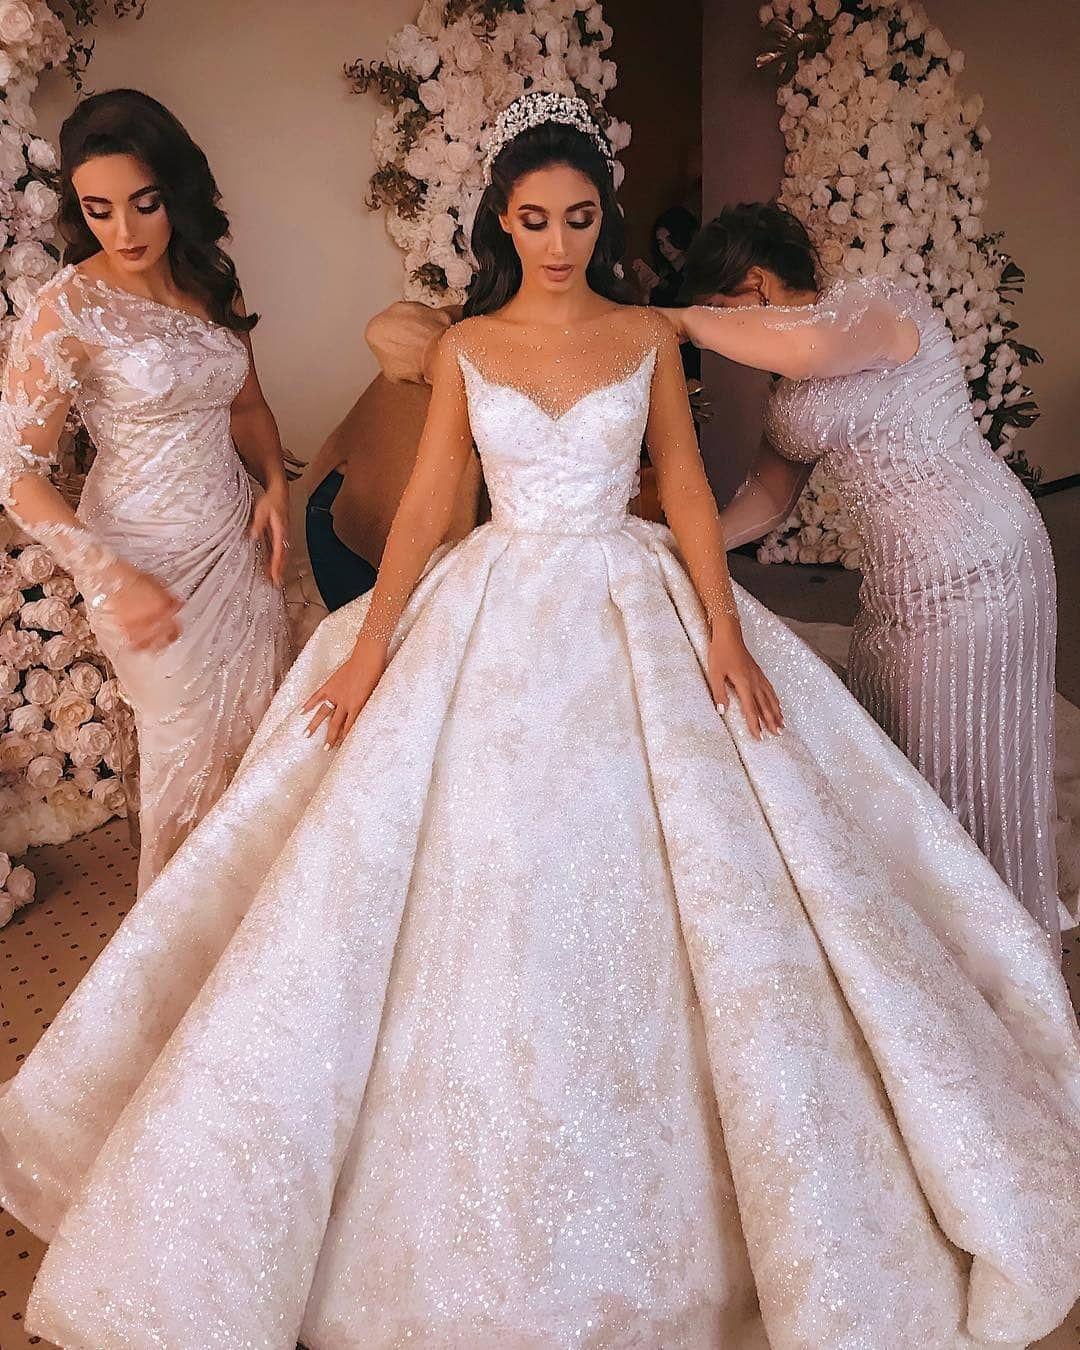 Custom Wedding Dresses And Bespoke Bridal Attire Dream Wedding Dresses Wedding Dresses Maxi Dress Wedding Guest [ 1350 x 1080 Pixel ]